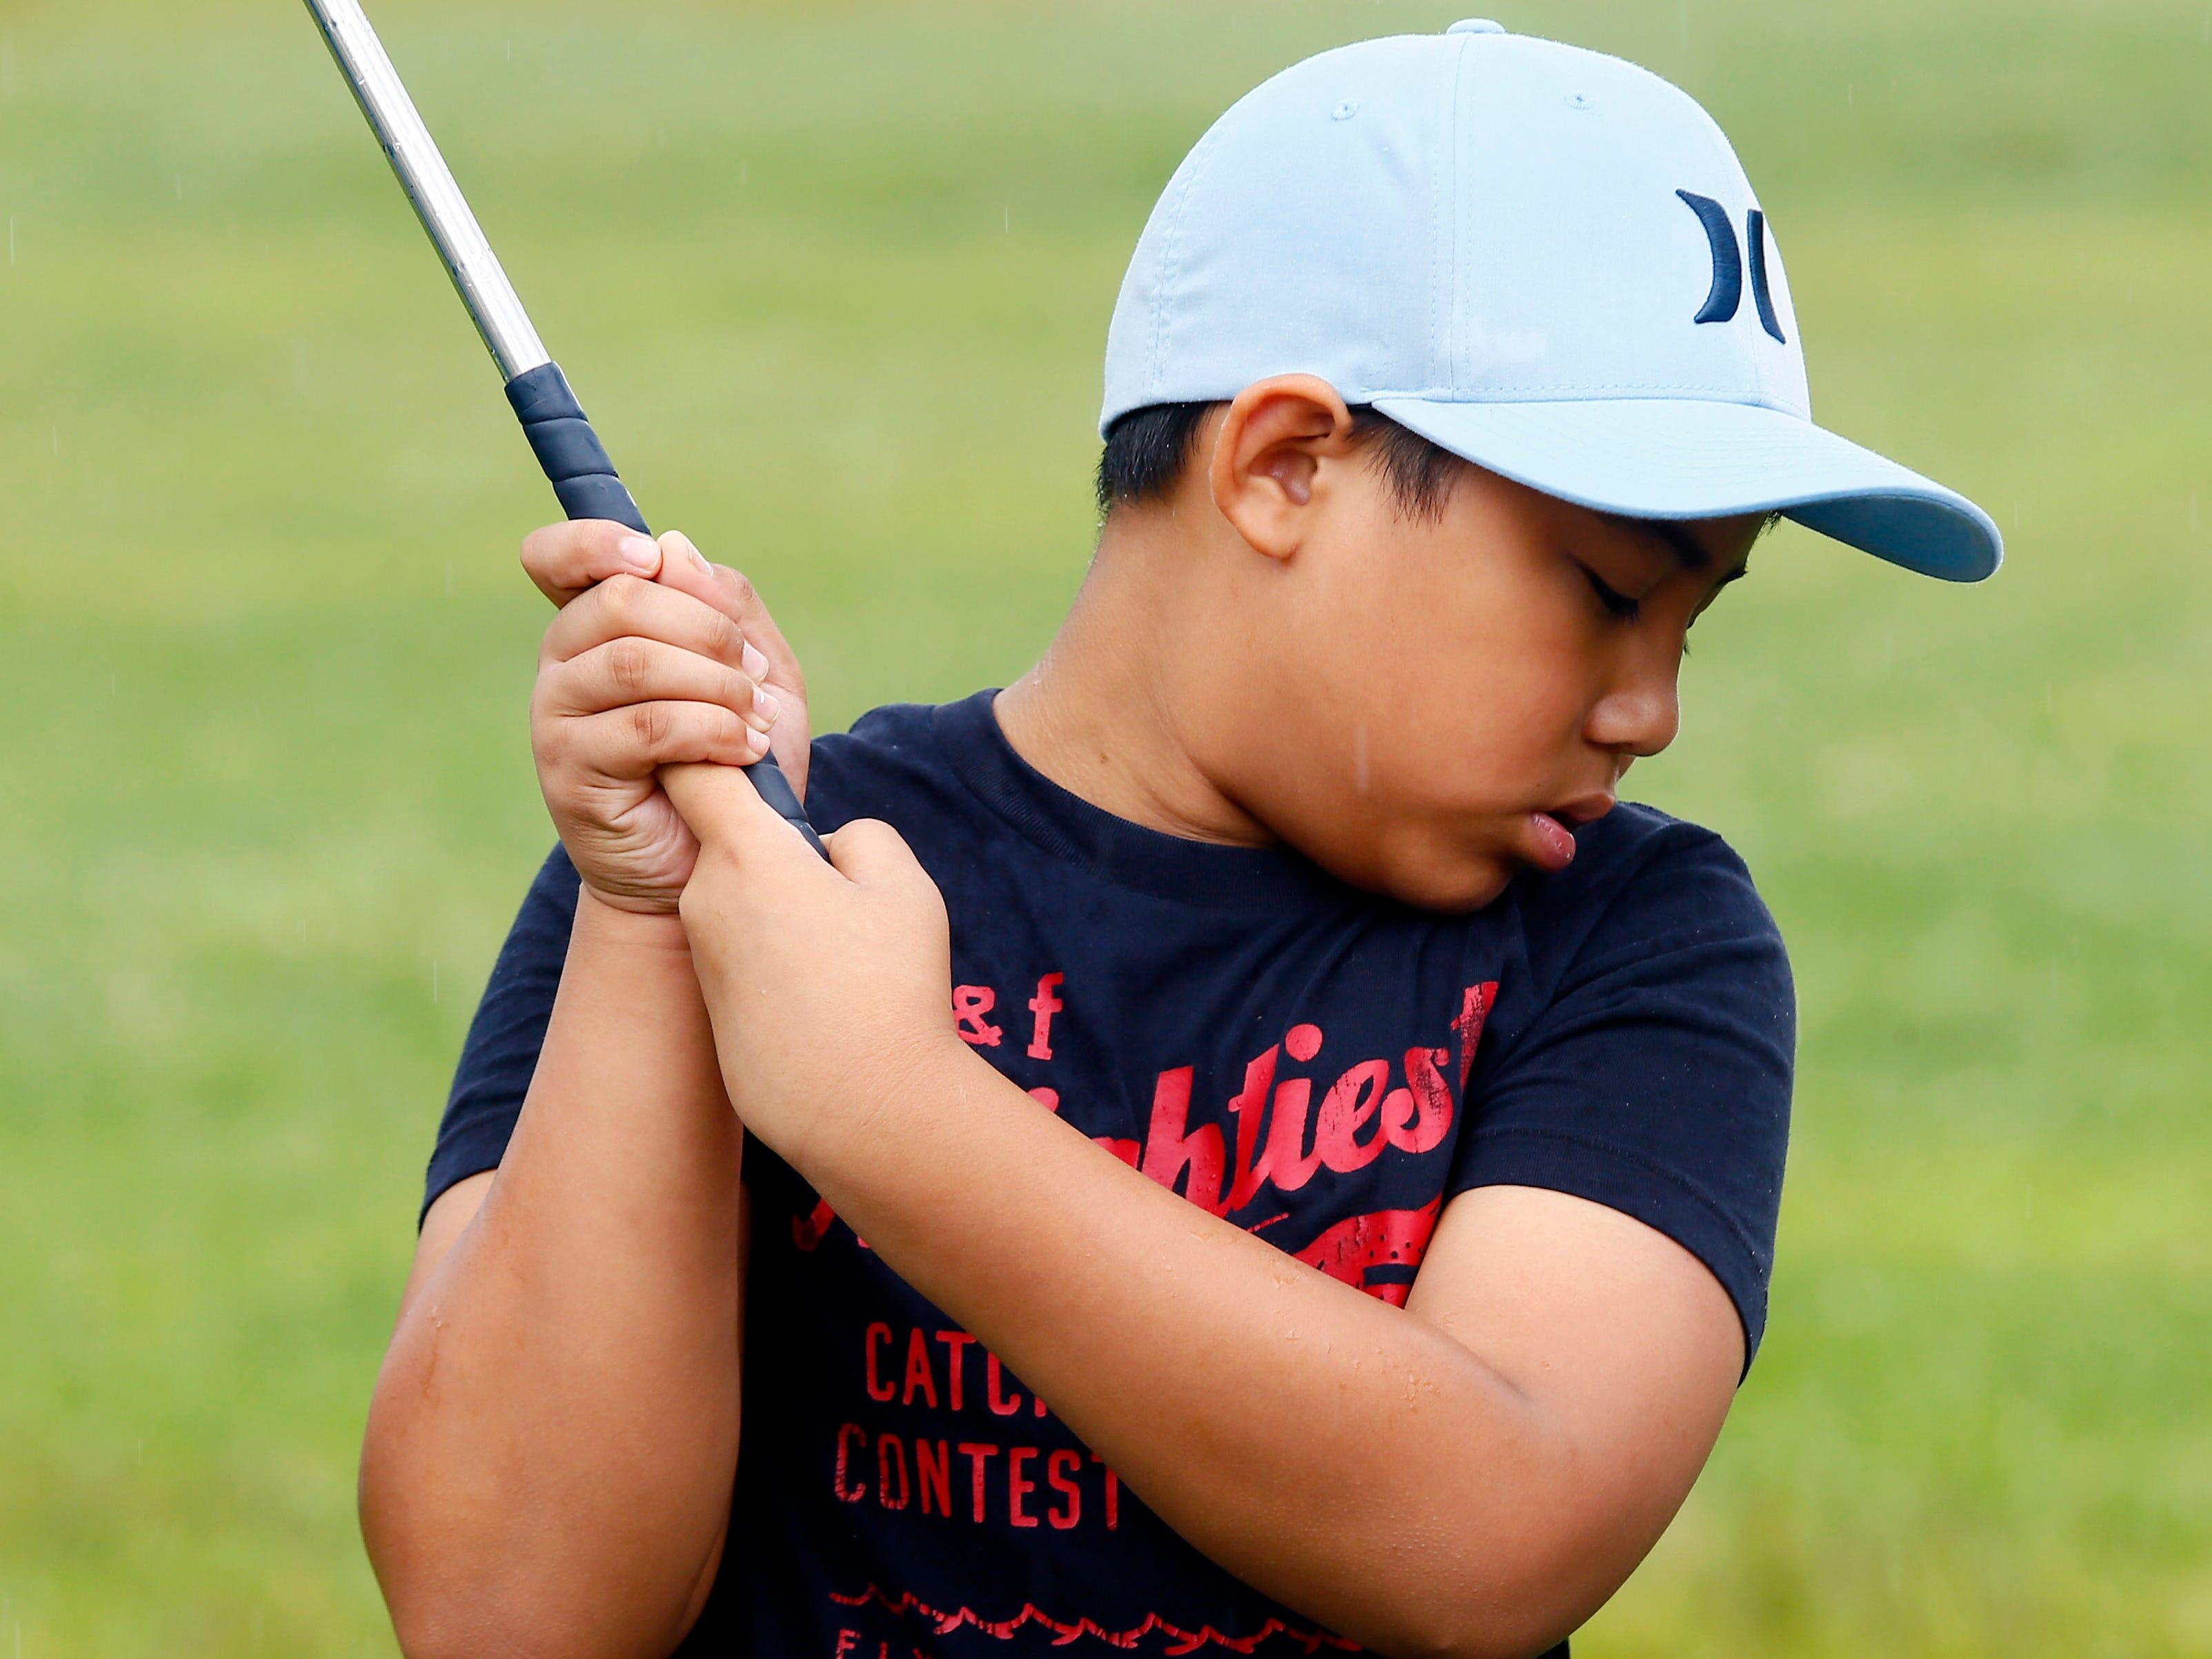 Joaquin Magracia, 9, of Parsippany drives the ball during Kids2Kids' summer golf program at Essex Golf Center. August 14, 2017, Roseland, NJ.